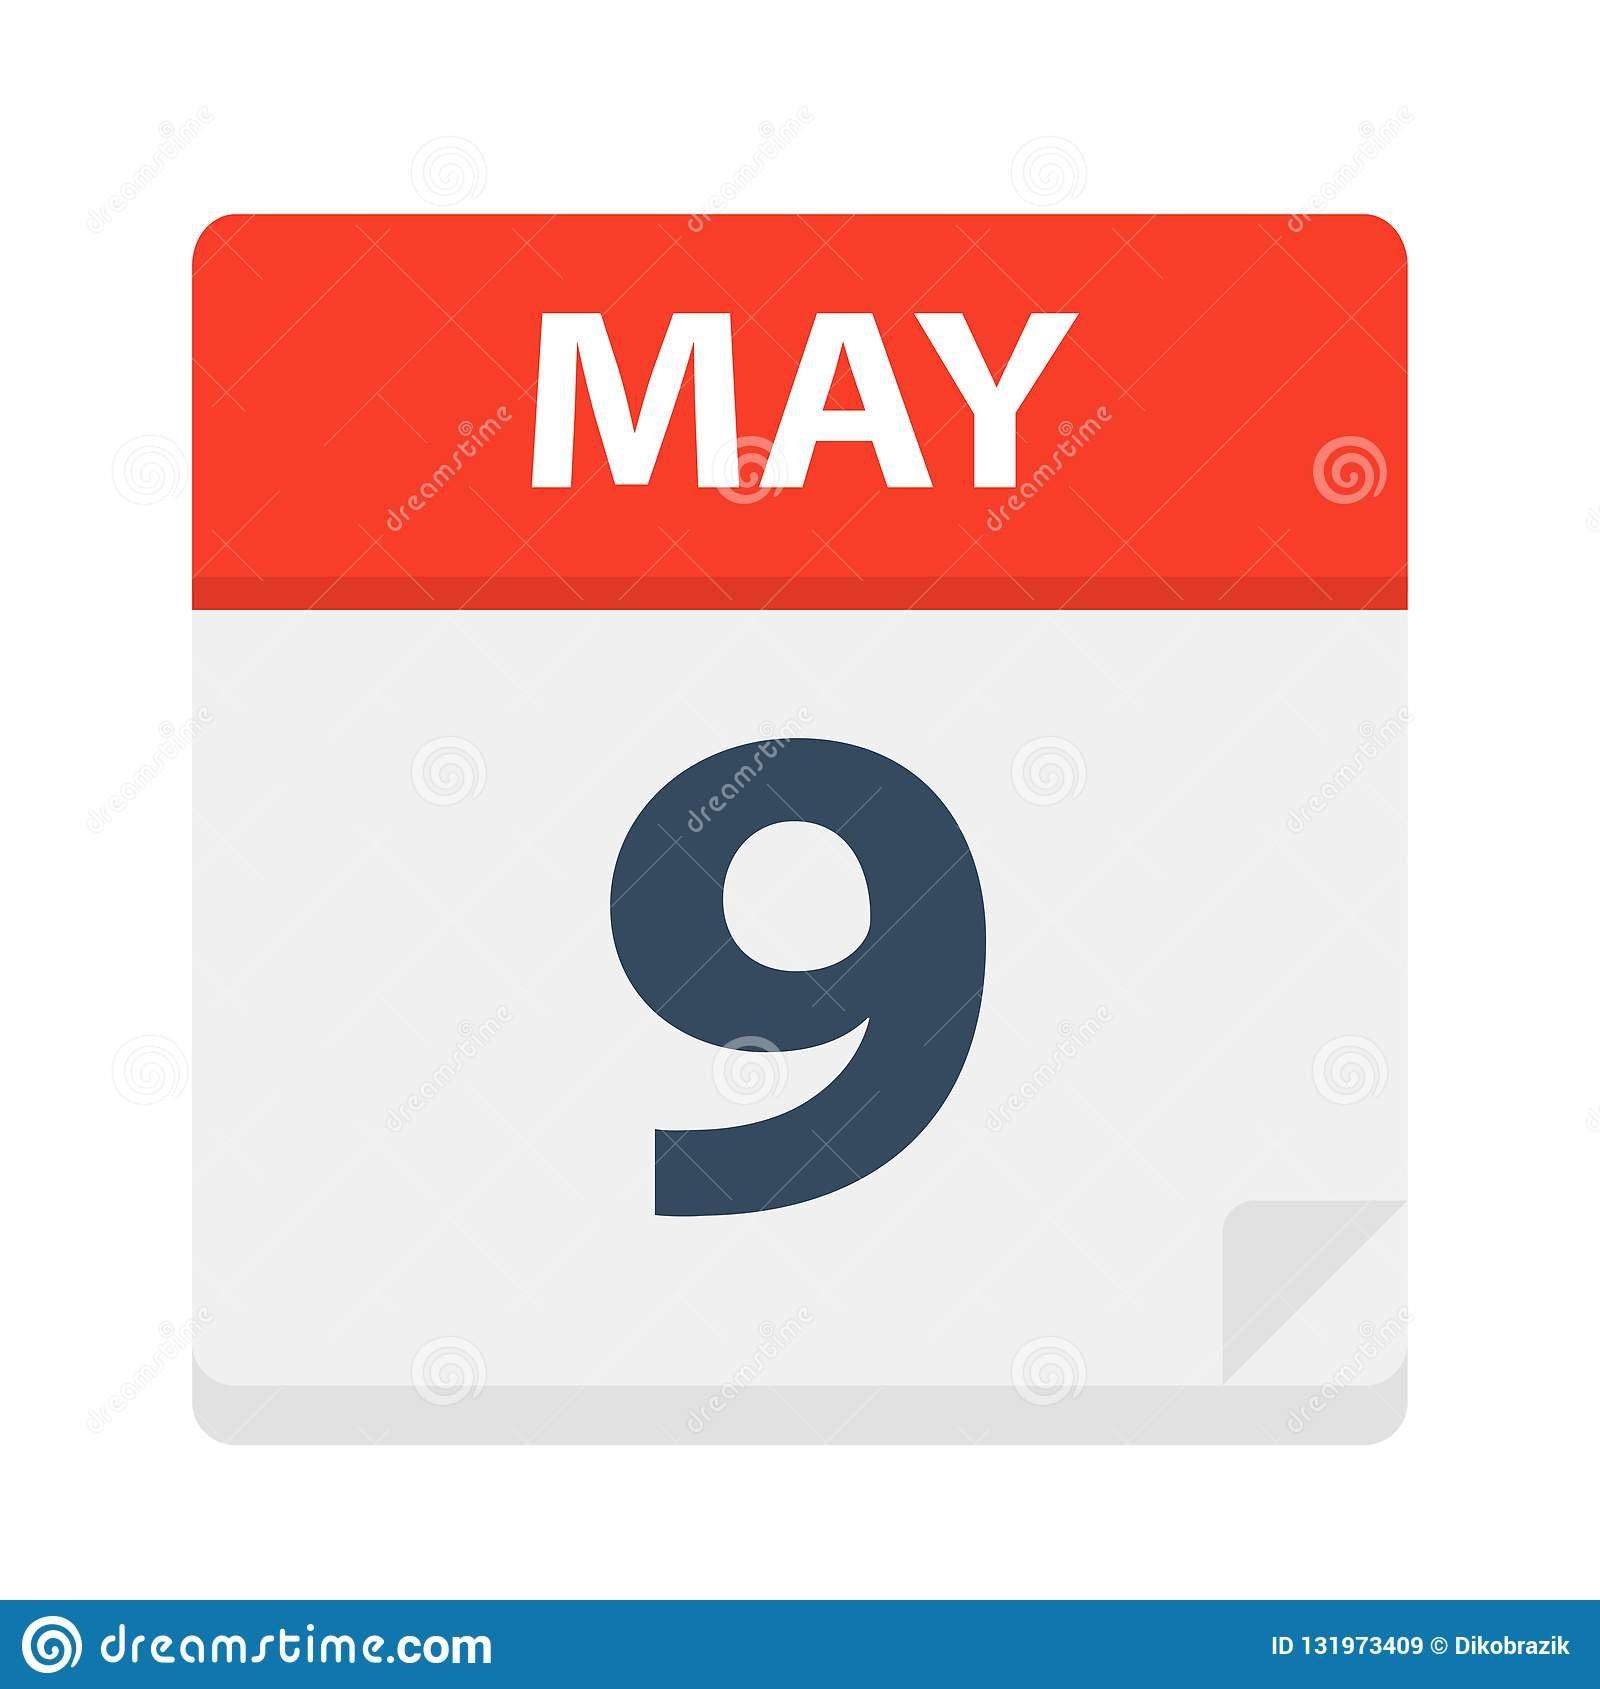 May 9 – Calendar Icon Stock Illustration. Illustration Of 2019 Calendar 9 2019